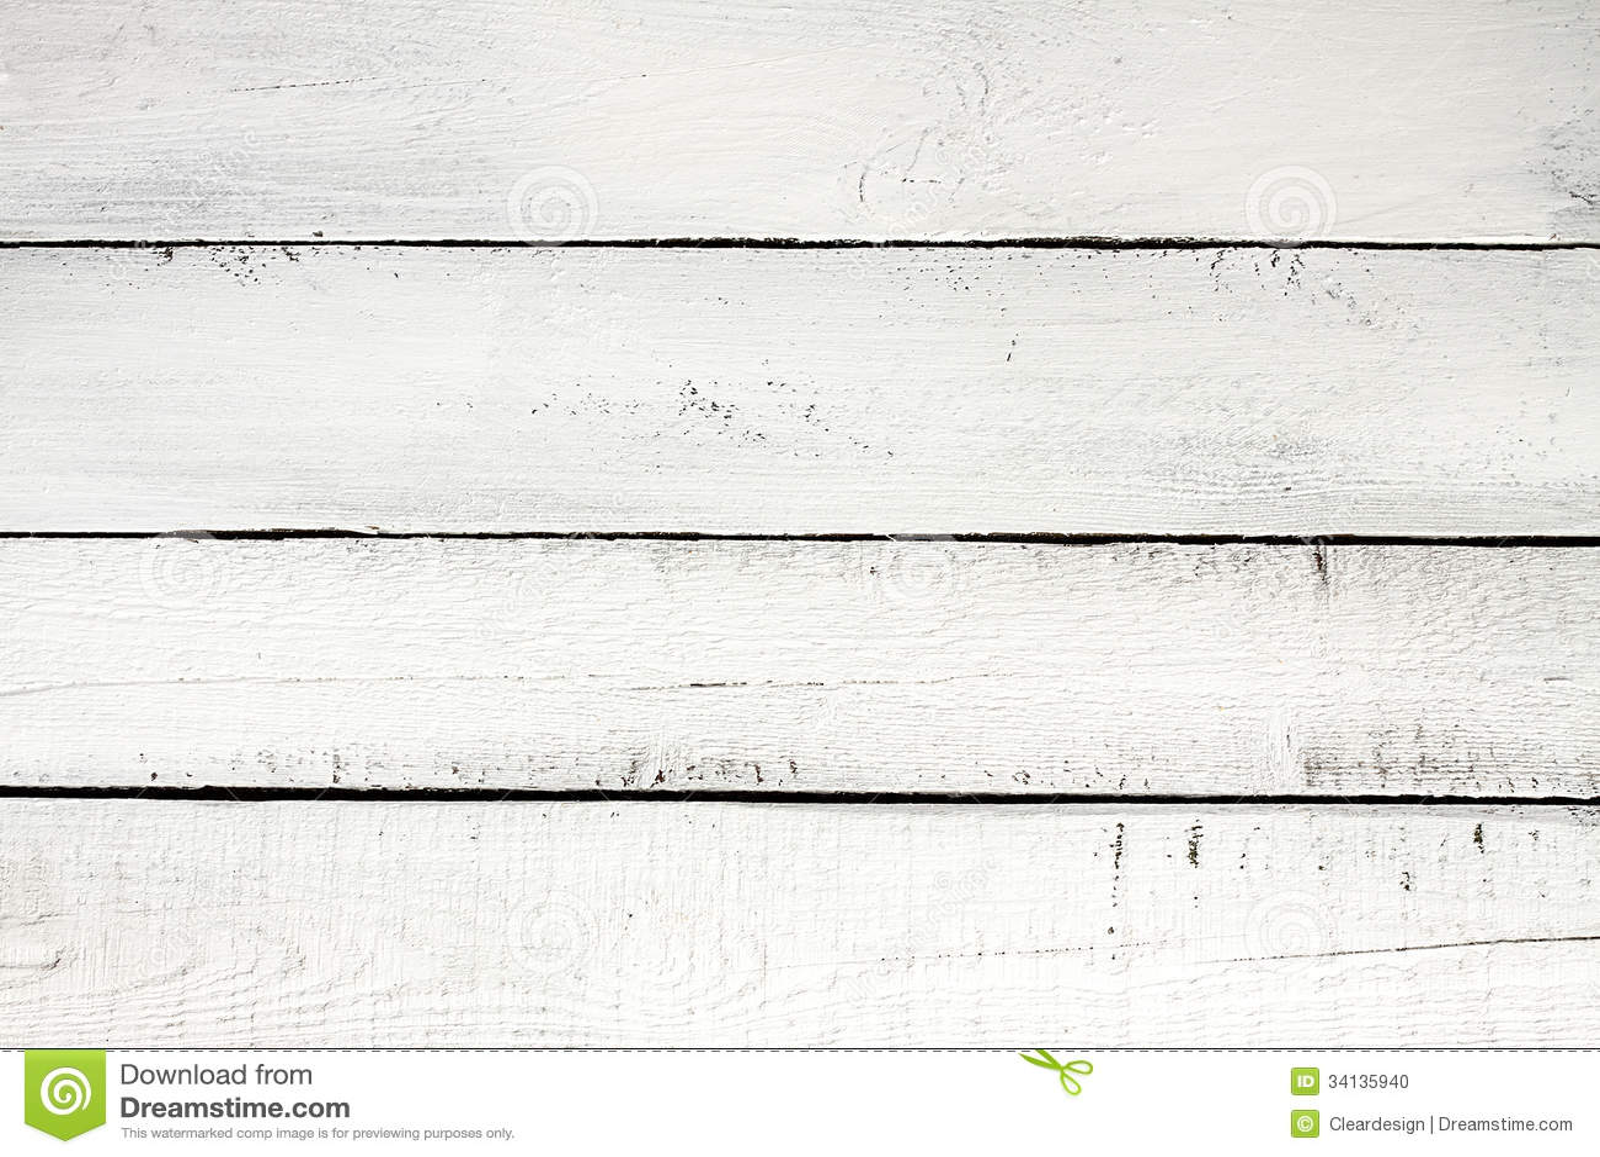 Vintage Painted Wood Sign Hd